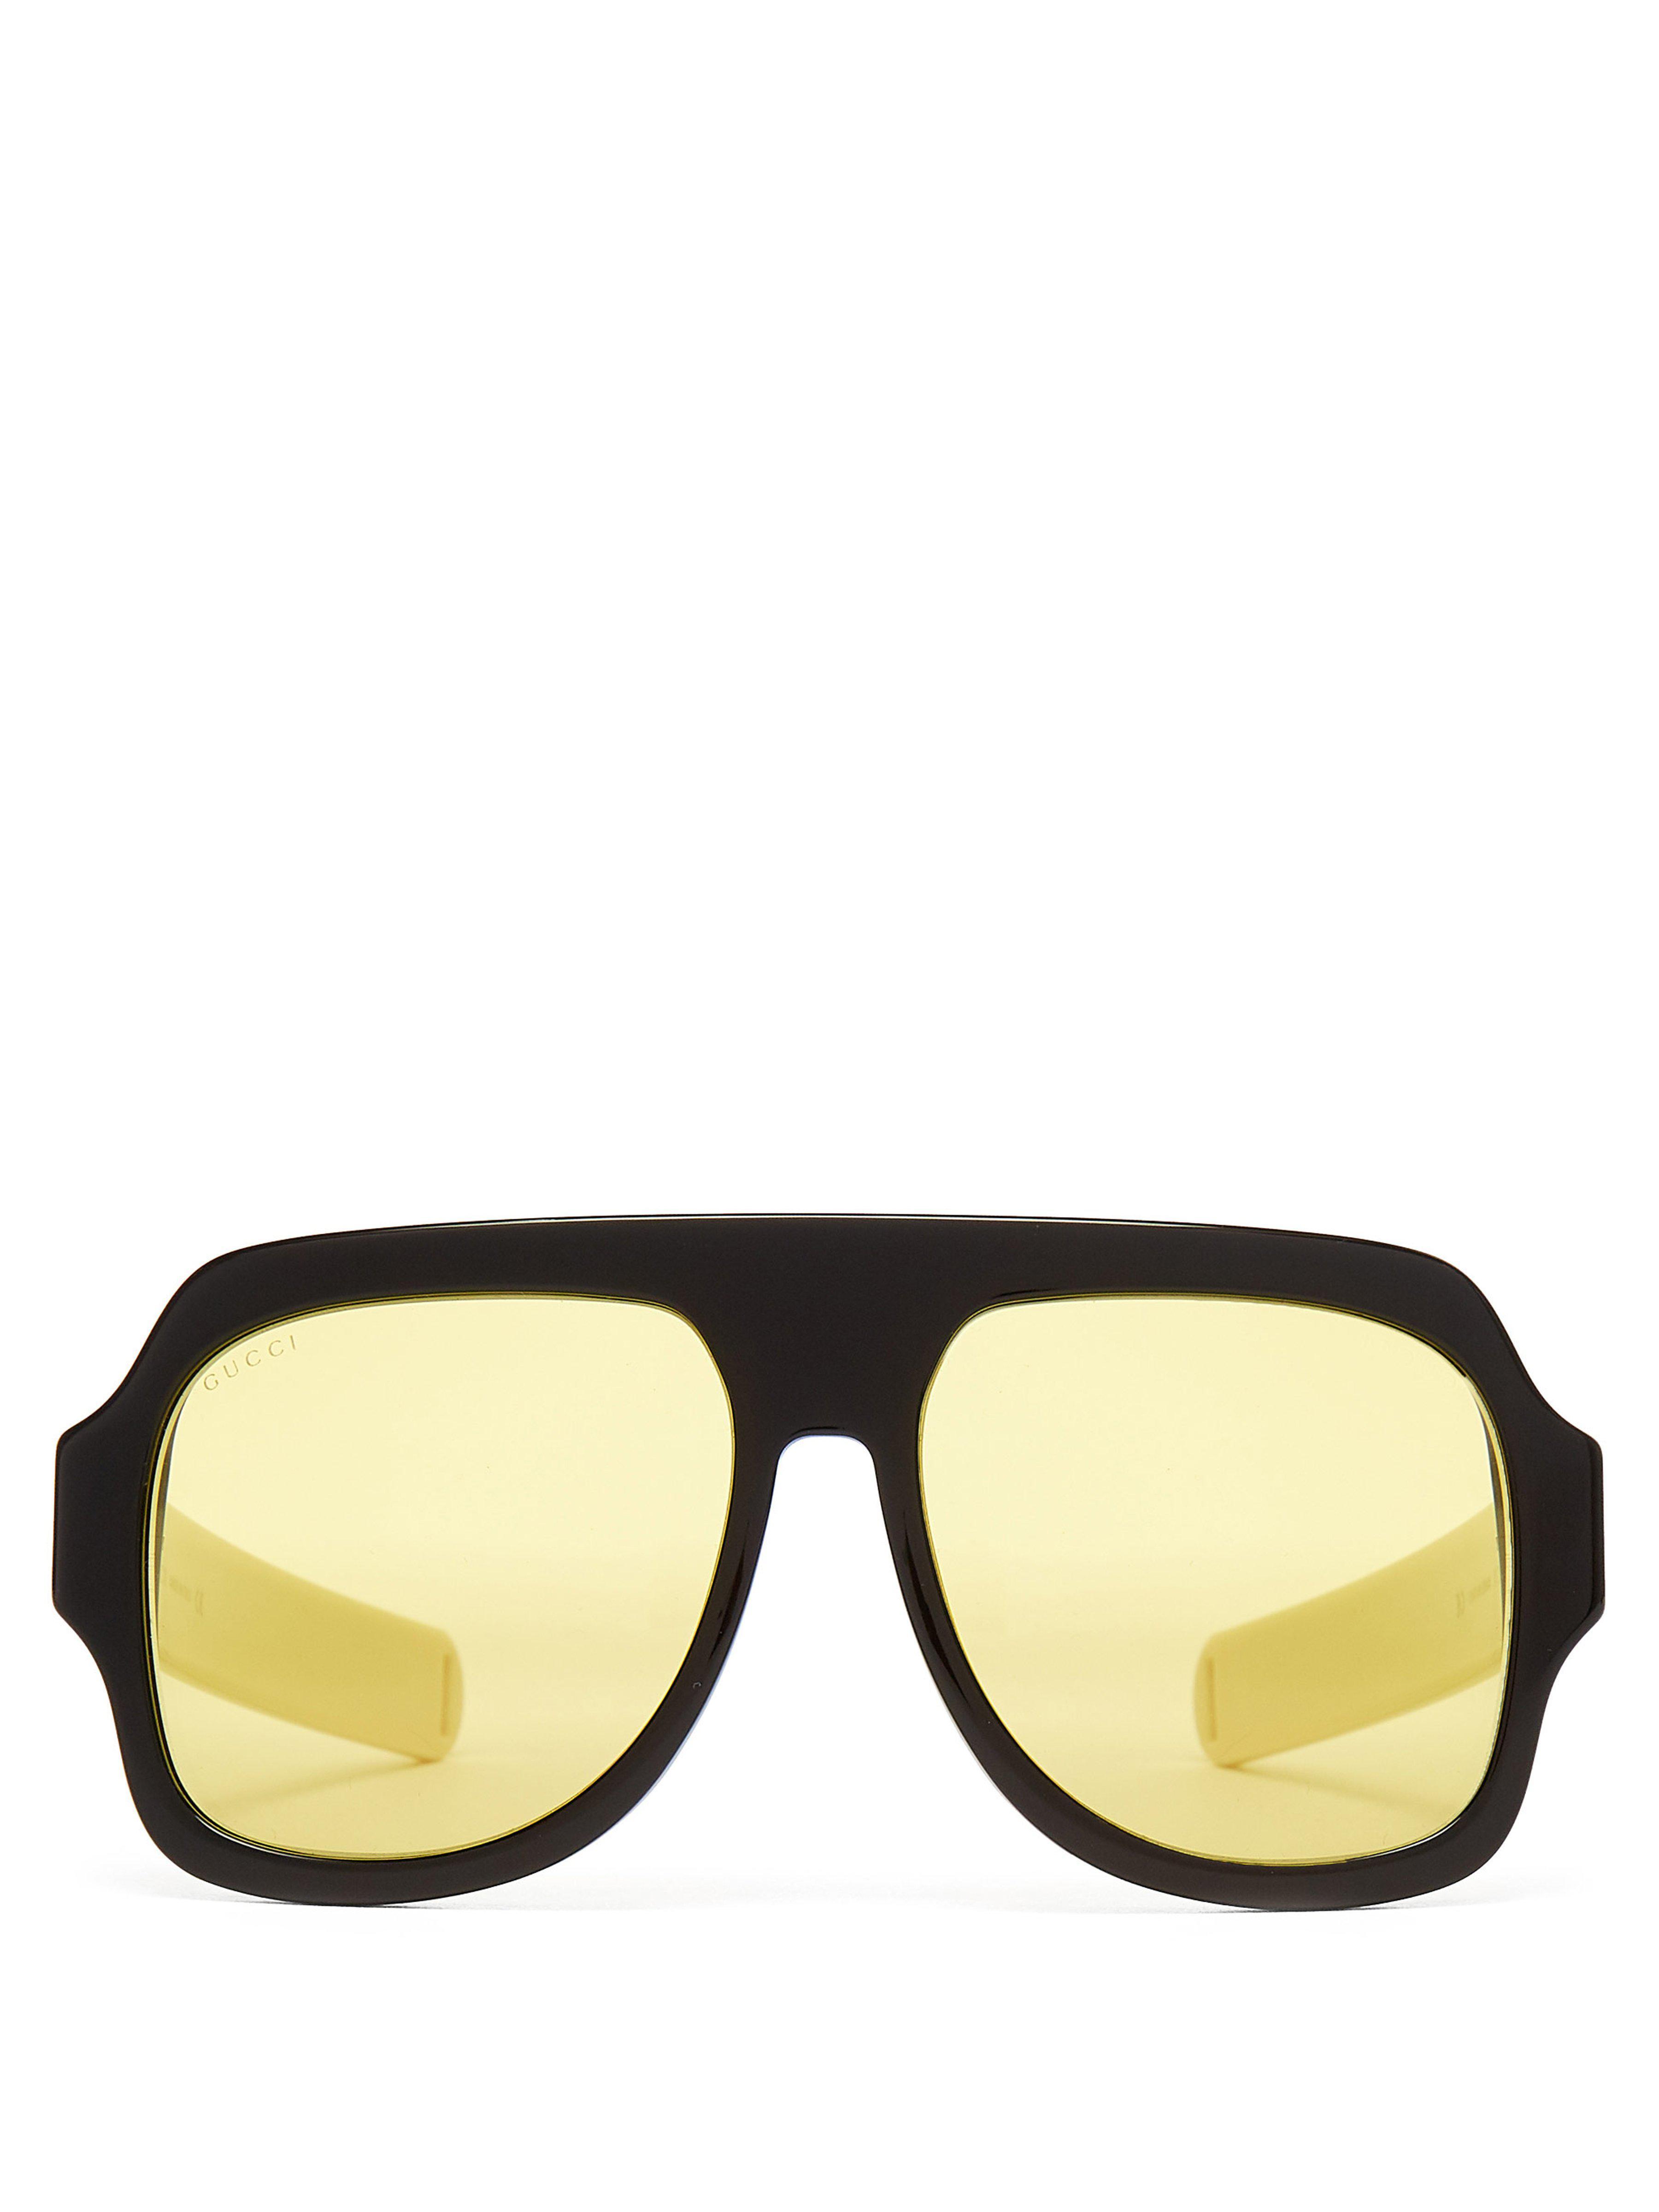 5f44d9faf8 Gucci - Black D Frame Acetate Sunglasses for Men - Lyst. View fullscreen